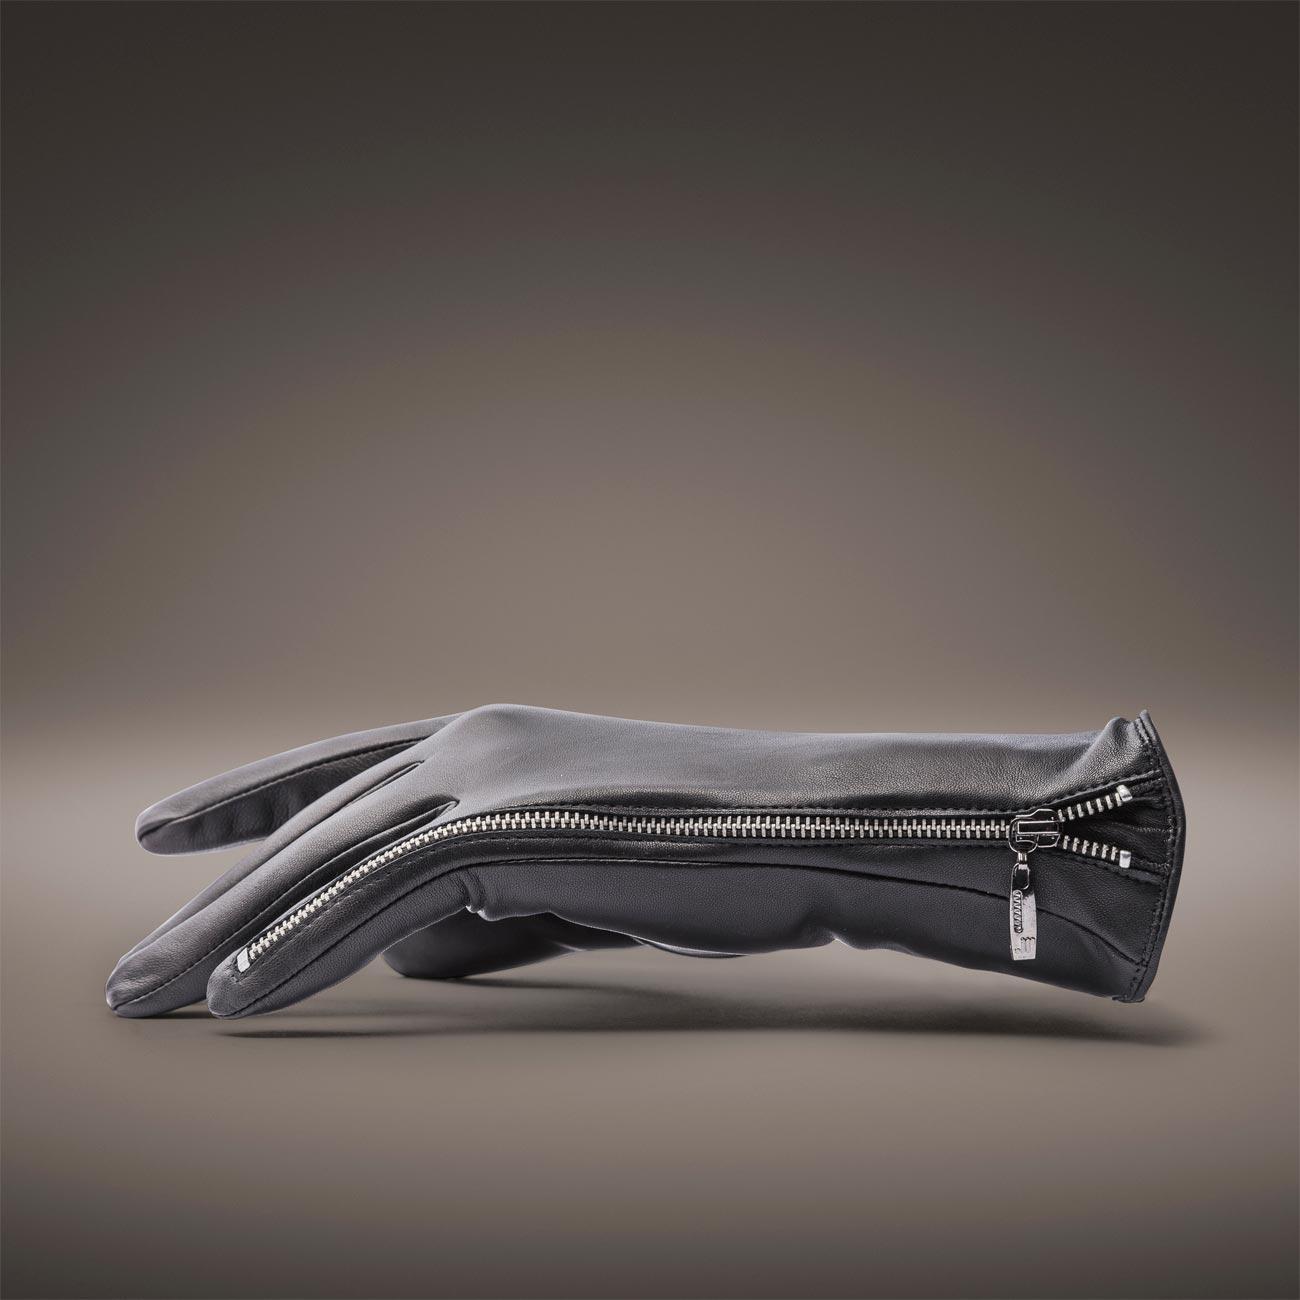 Hochwertige Handschuhe Produzent | Hersteller hochwertiger Handschuhe